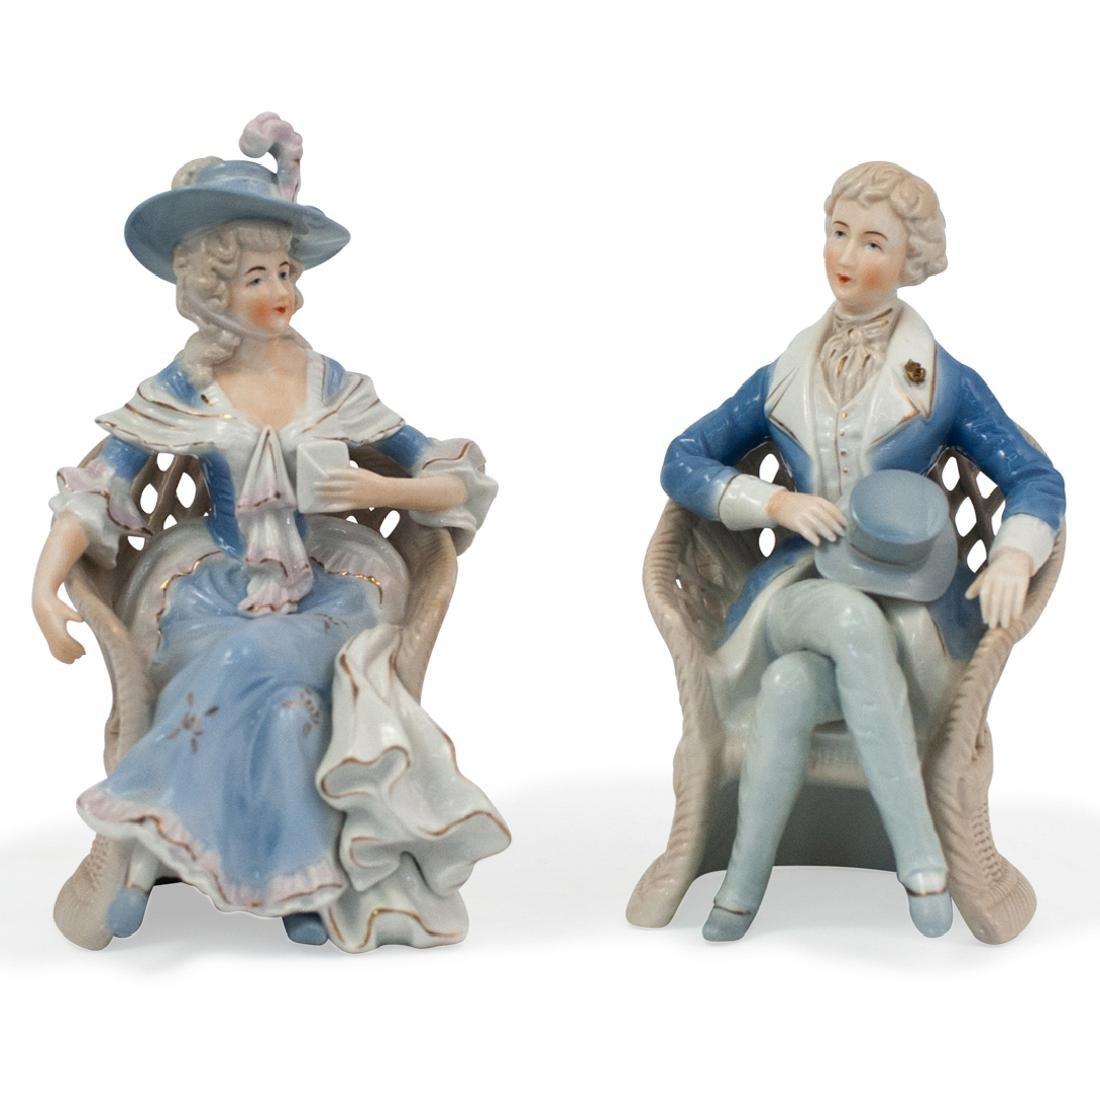 Pair of Lenwile Ardalt Porcelain Figurines